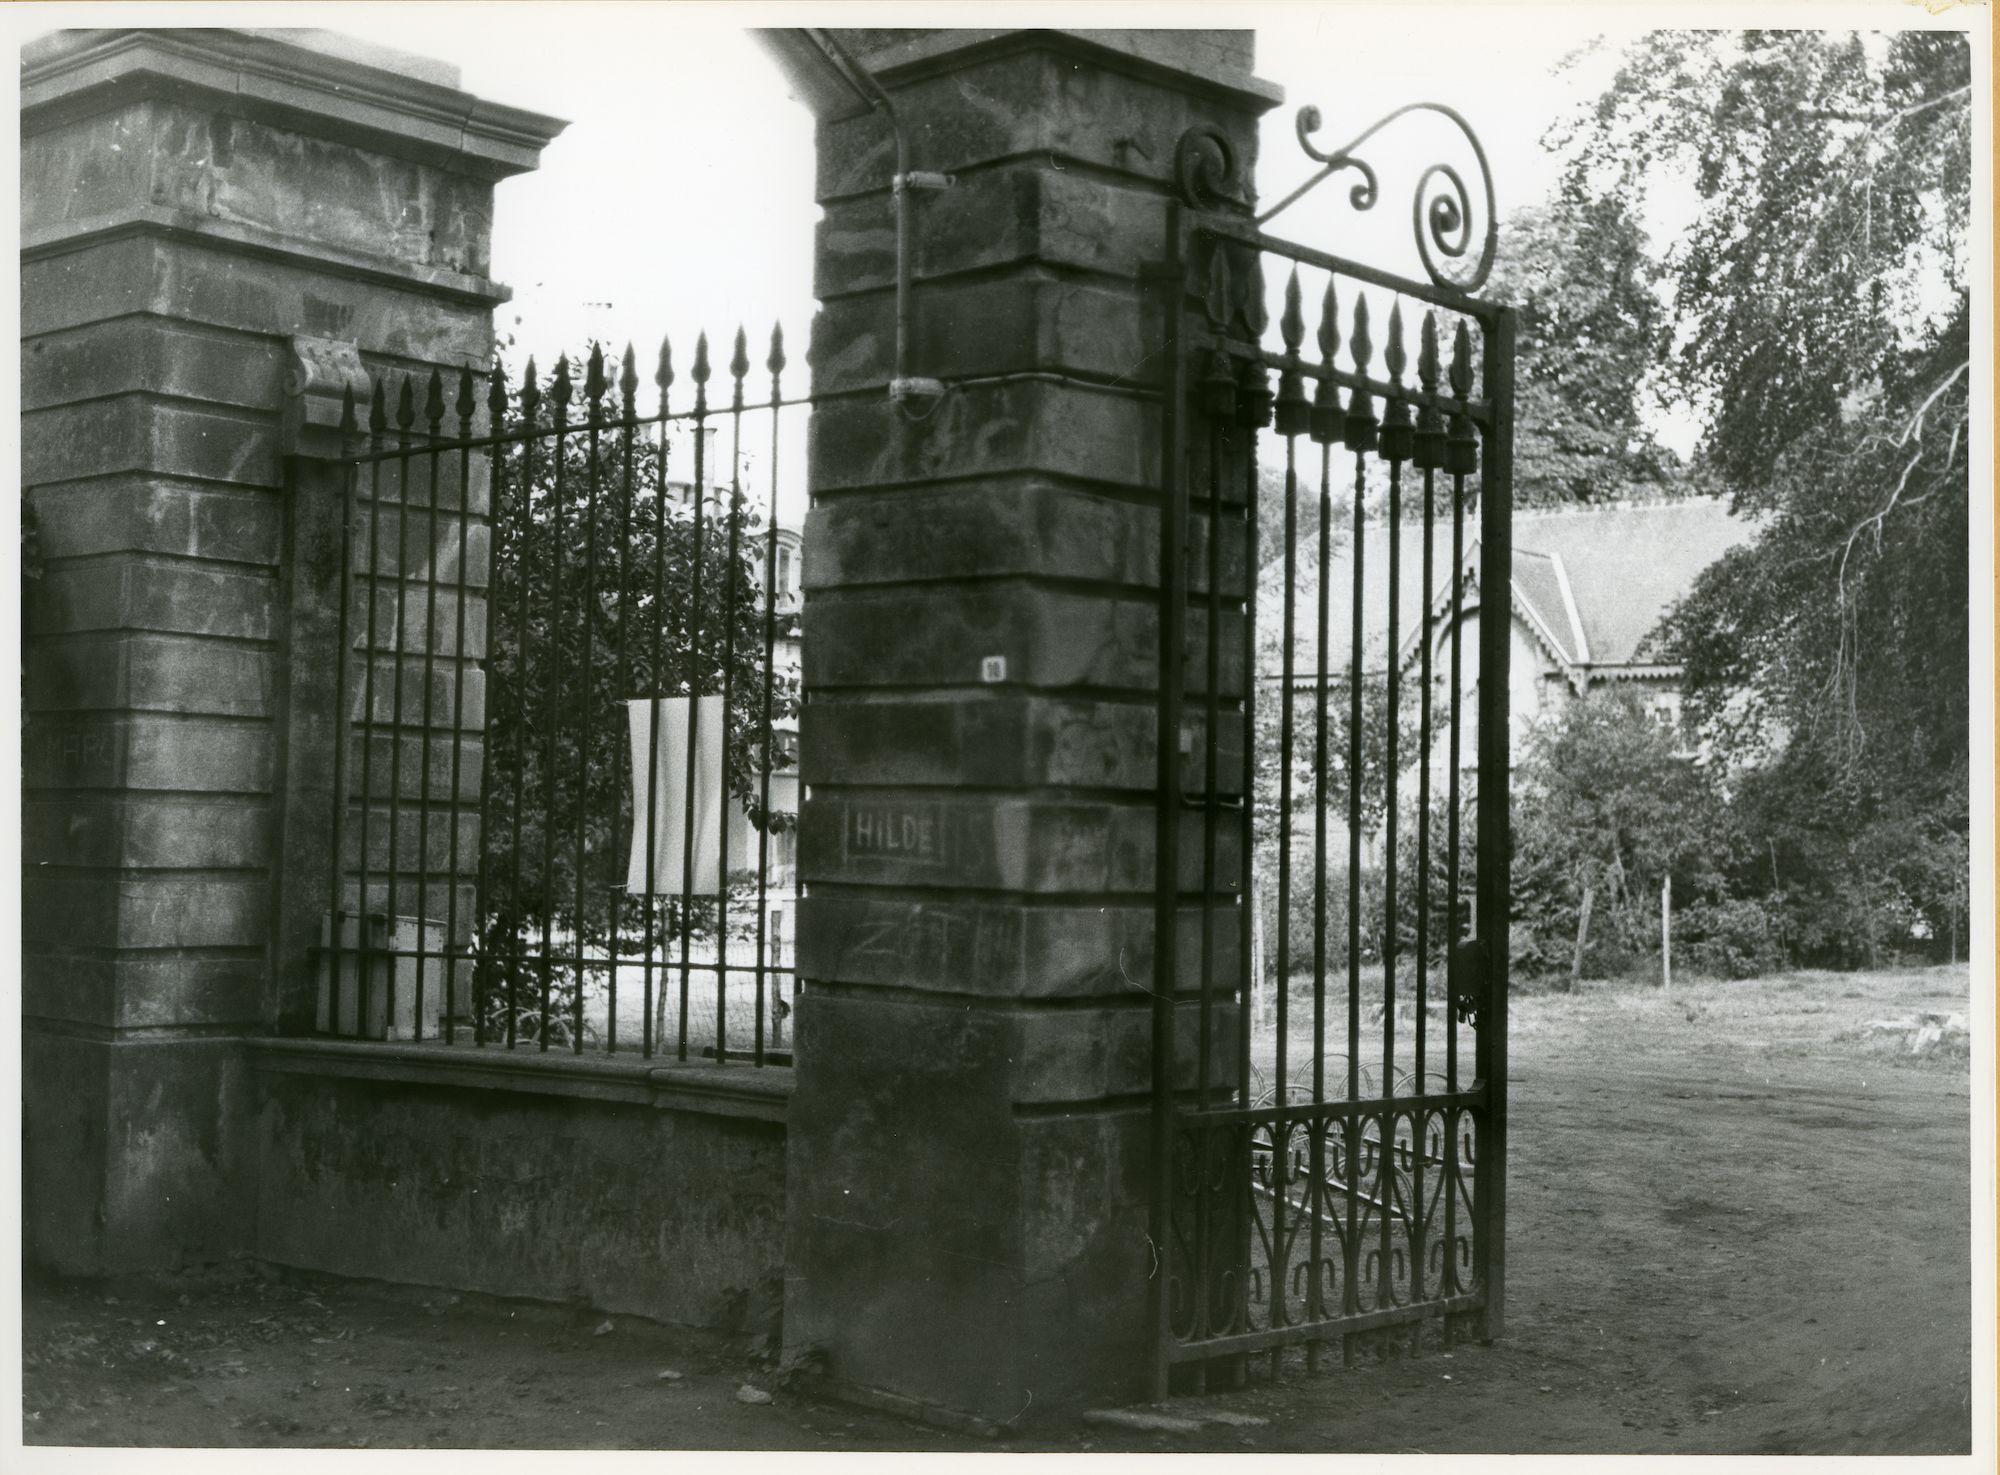 Mariakerke: Alphonse Claeys Bouuaertlaan: Hek, 1979